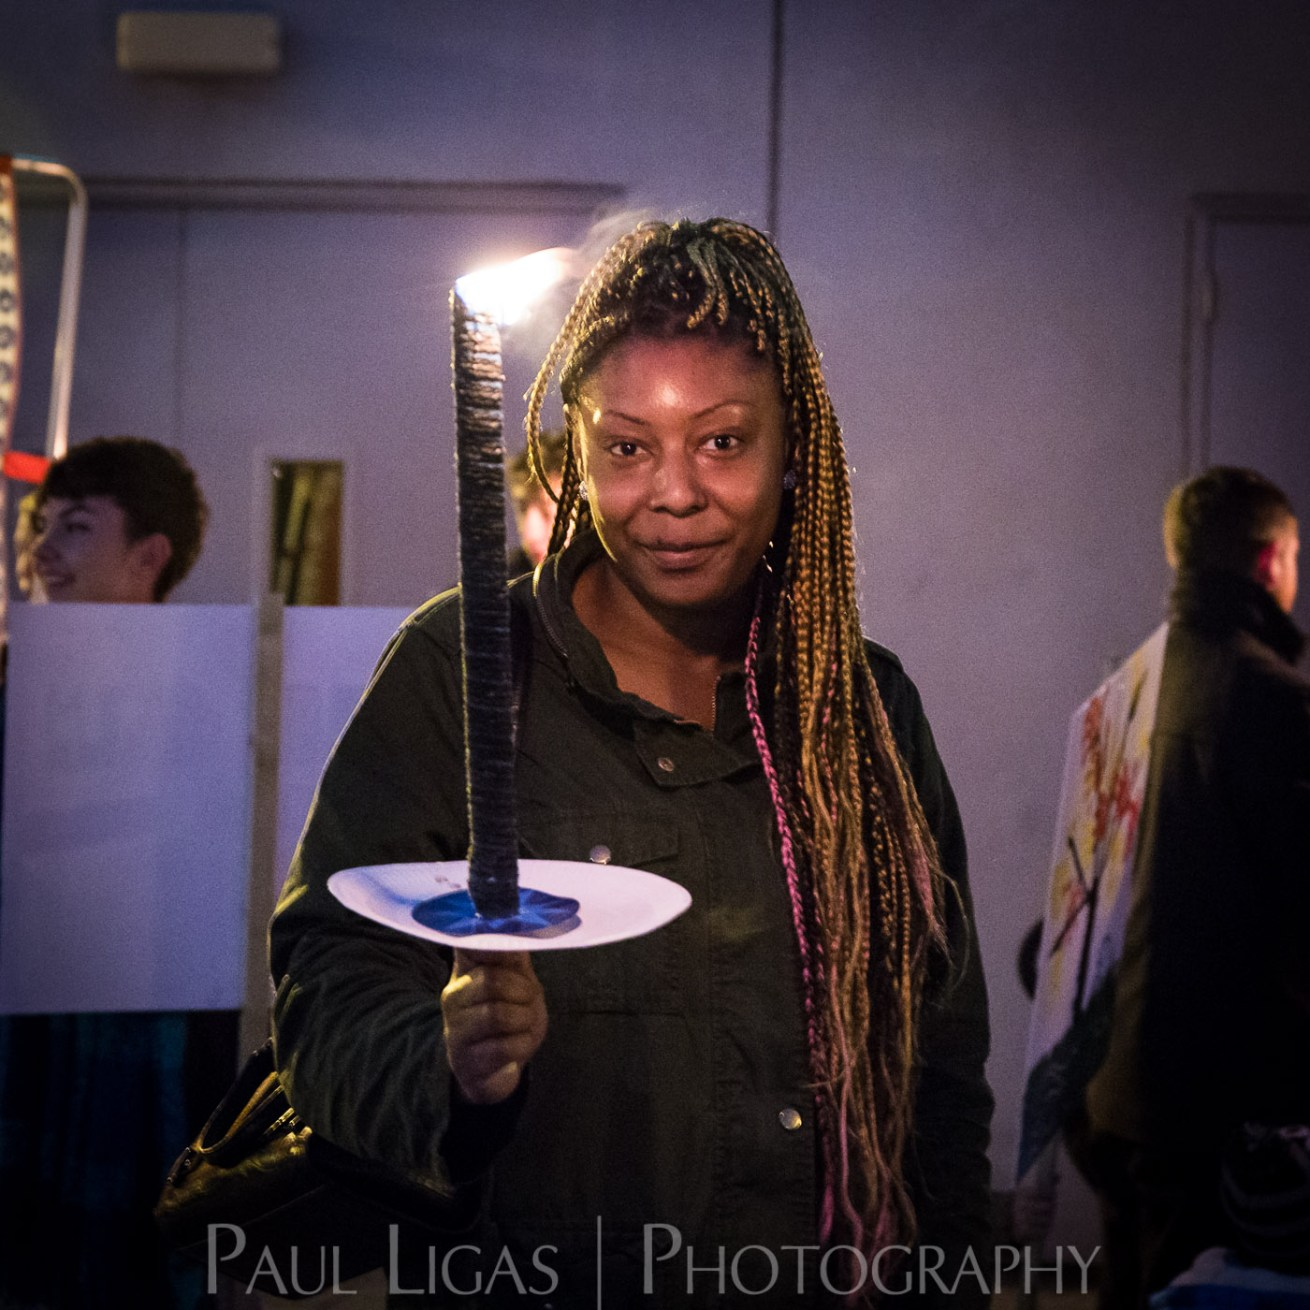 Longbridge Light Festival, Birmingham event photographer herefordshire photography people 3941